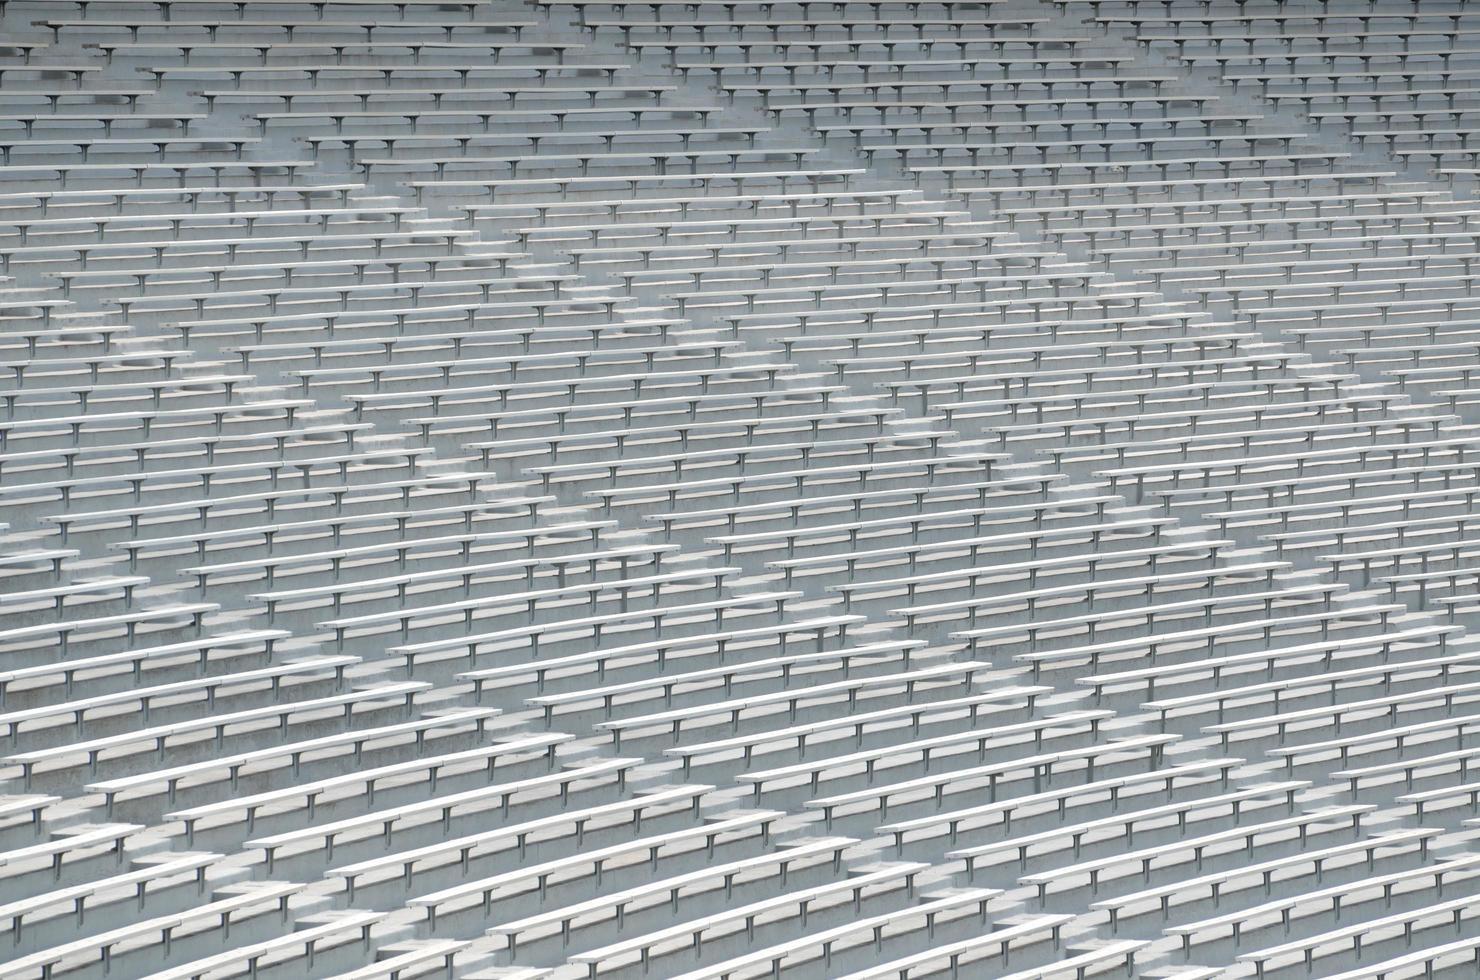 Seats in the stadium photo